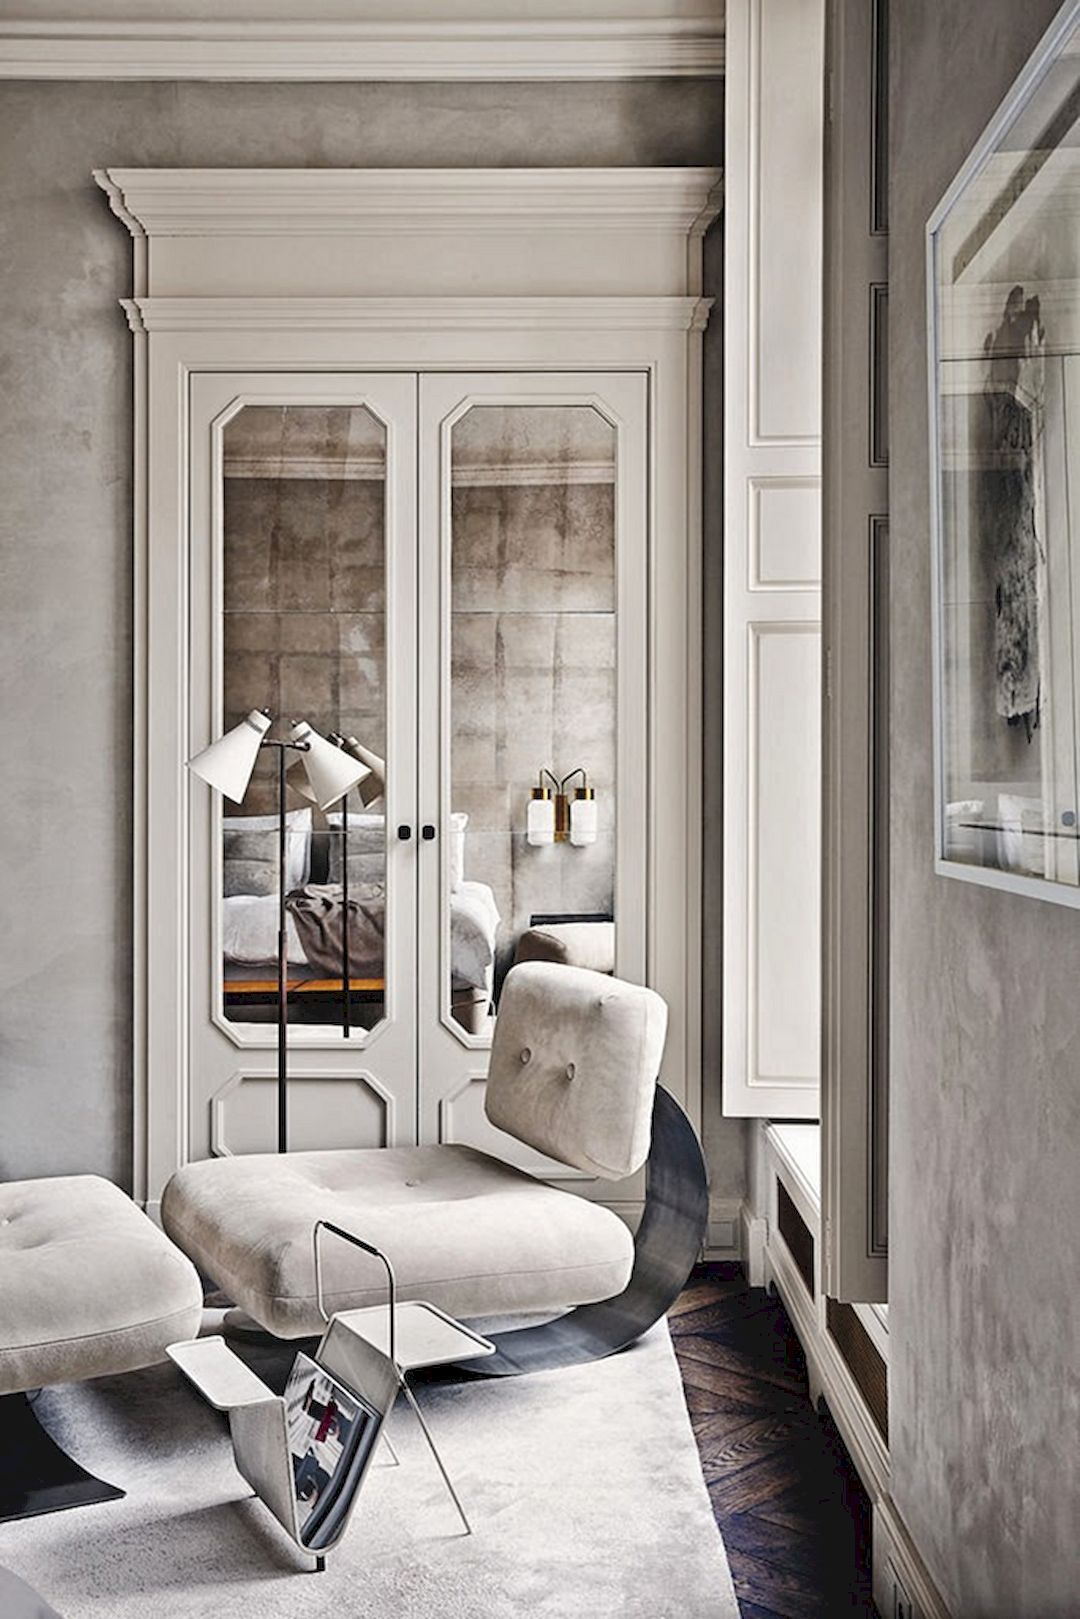 46 Stunning Modern Interior Design Ideas From Joseph Dirand  Https://www.futuristarchitecture.com/18477 Joseph Dirand Interior.html